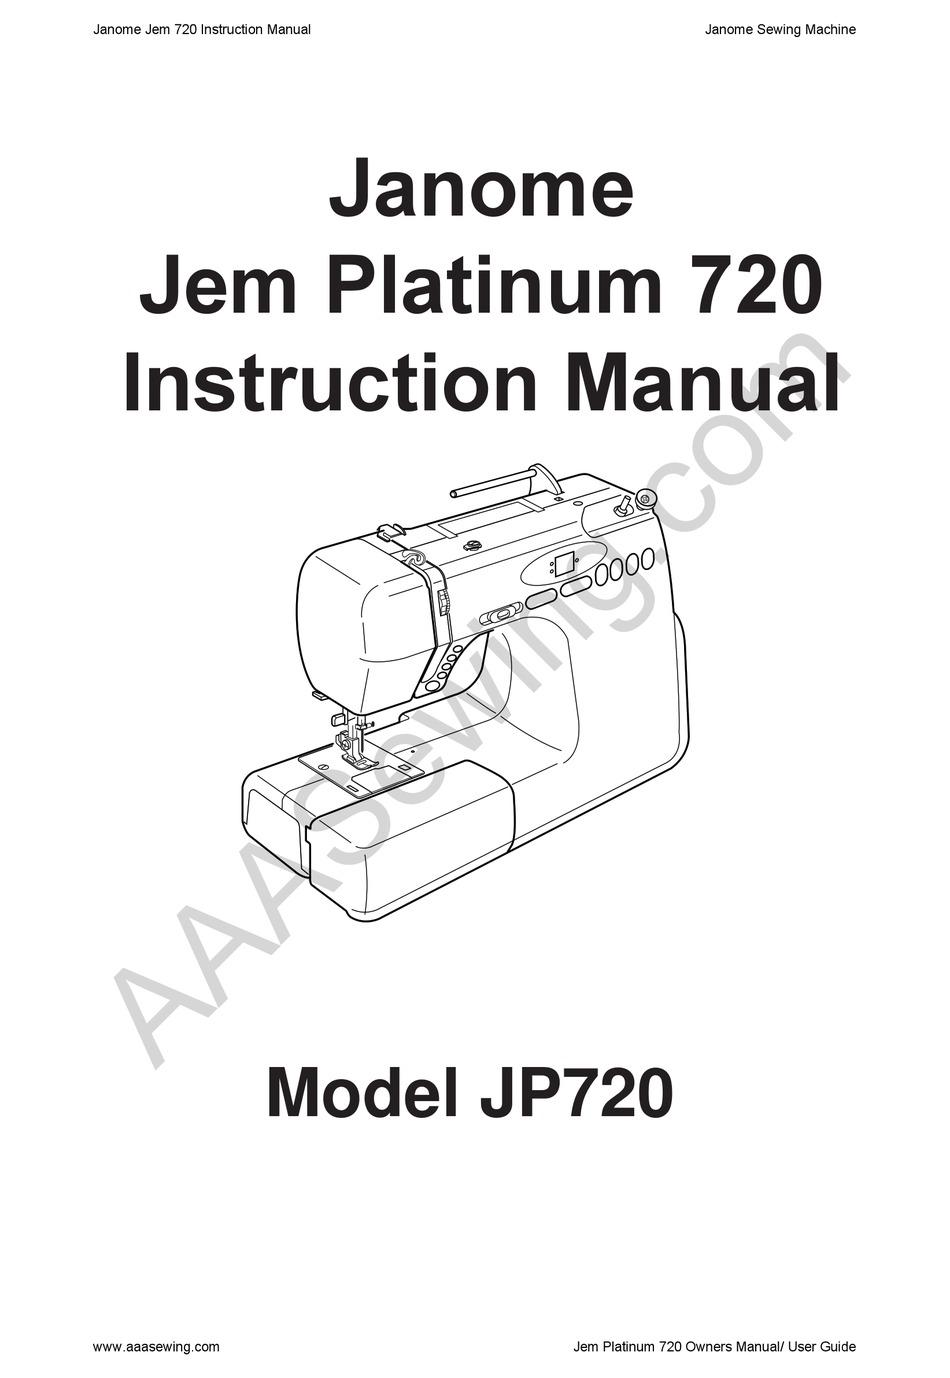 JANOME JEM PLATINUM 720 INSTRUCTION MANUAL Pdf Download